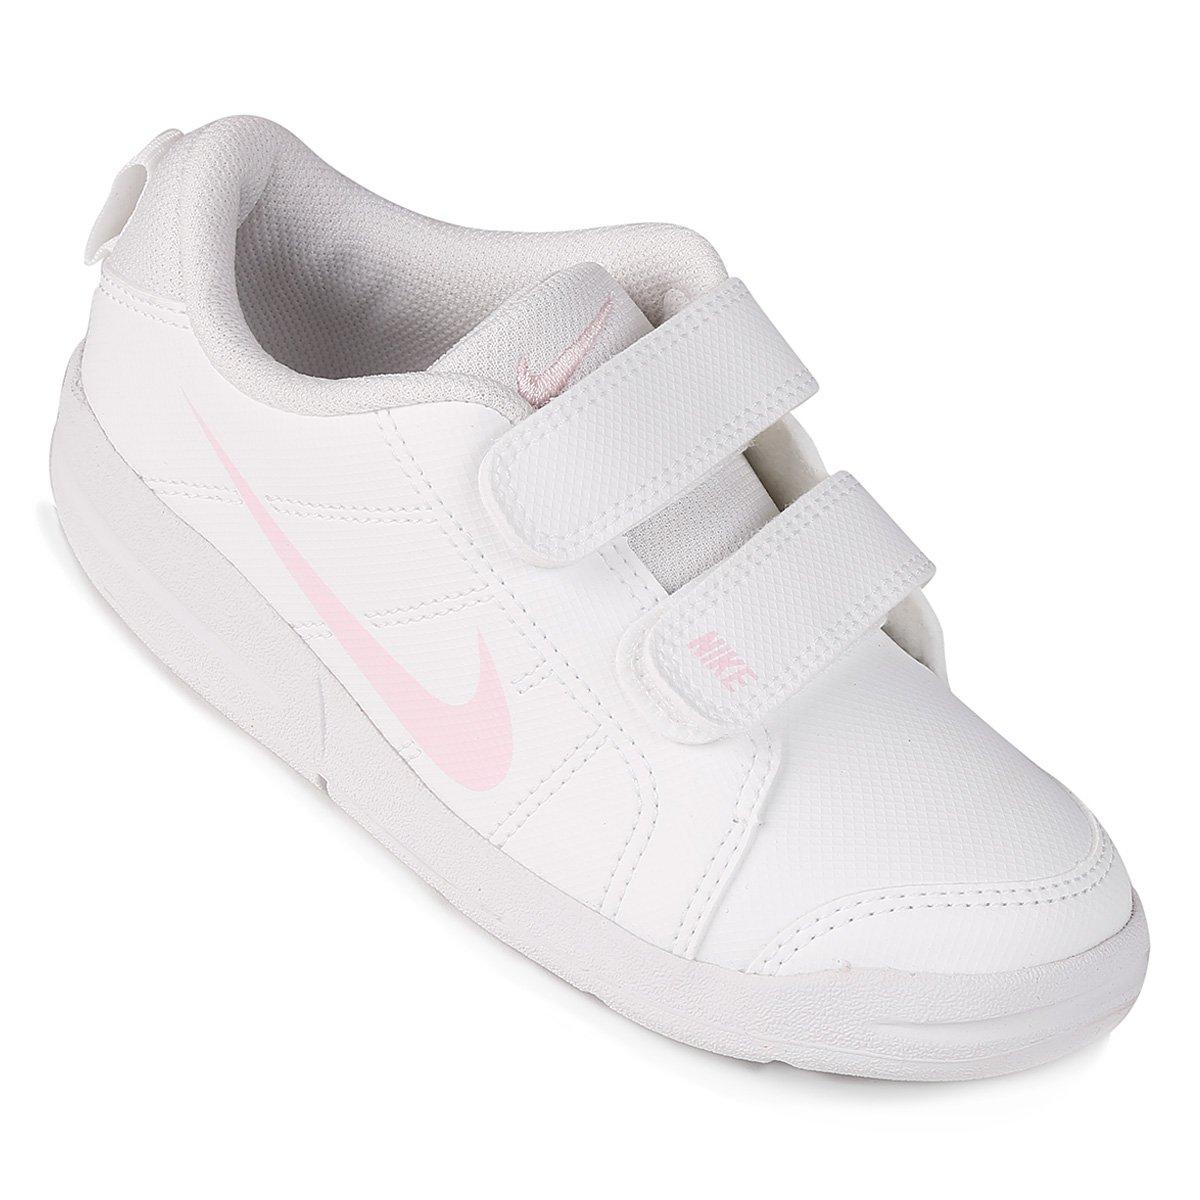 56c323ce6c4 Tênis Infantil Nike Pico Lt. undefined